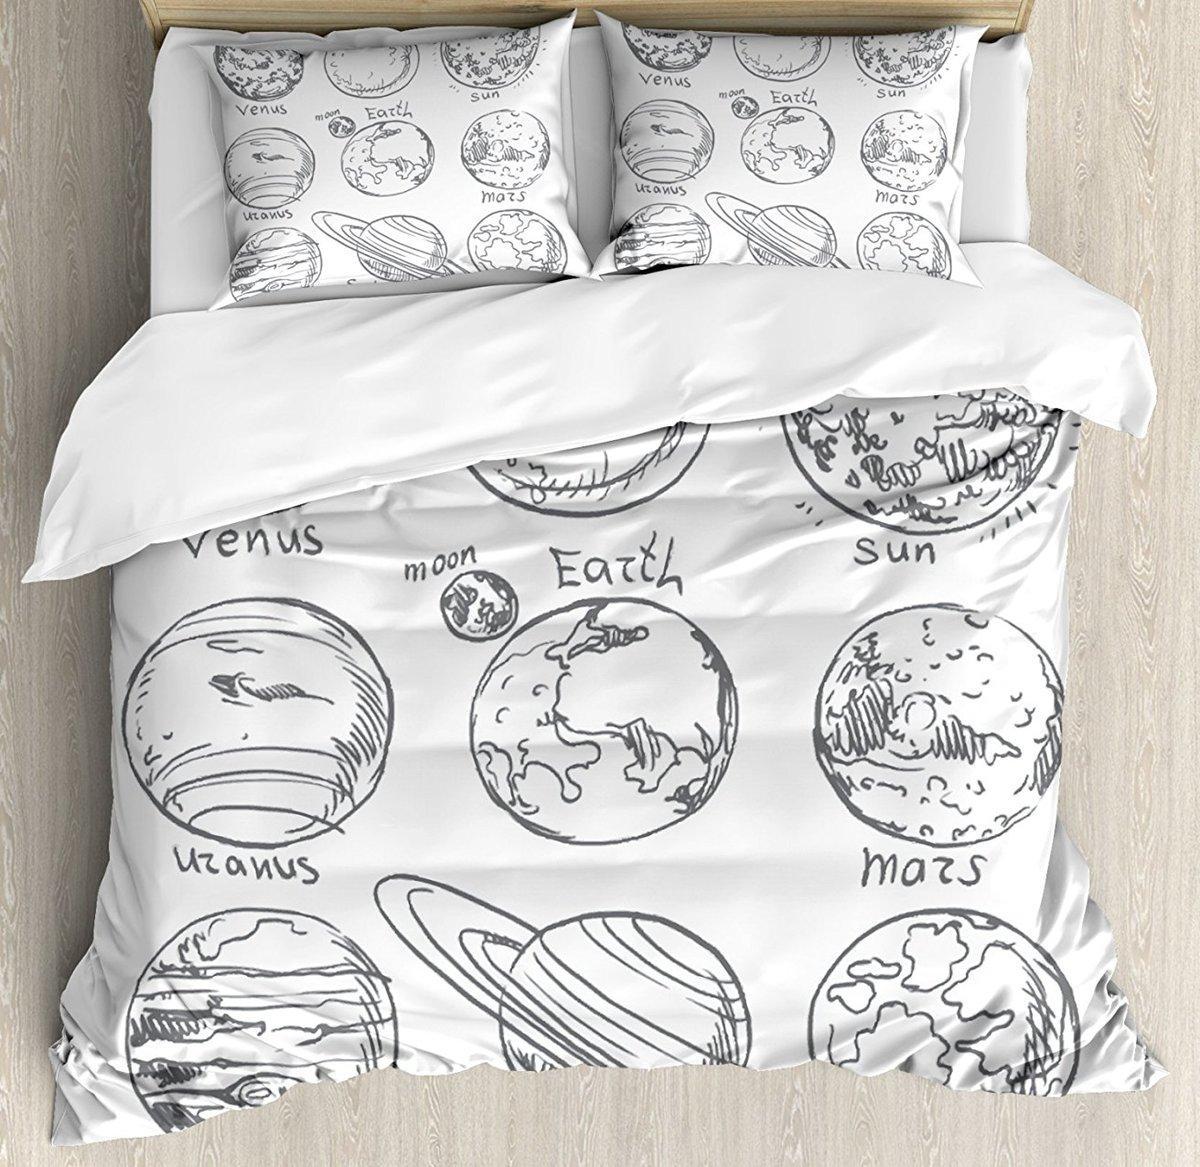 Großhandel Doodle Bettbezug Set Planeten Des Sonnensystems Sonne